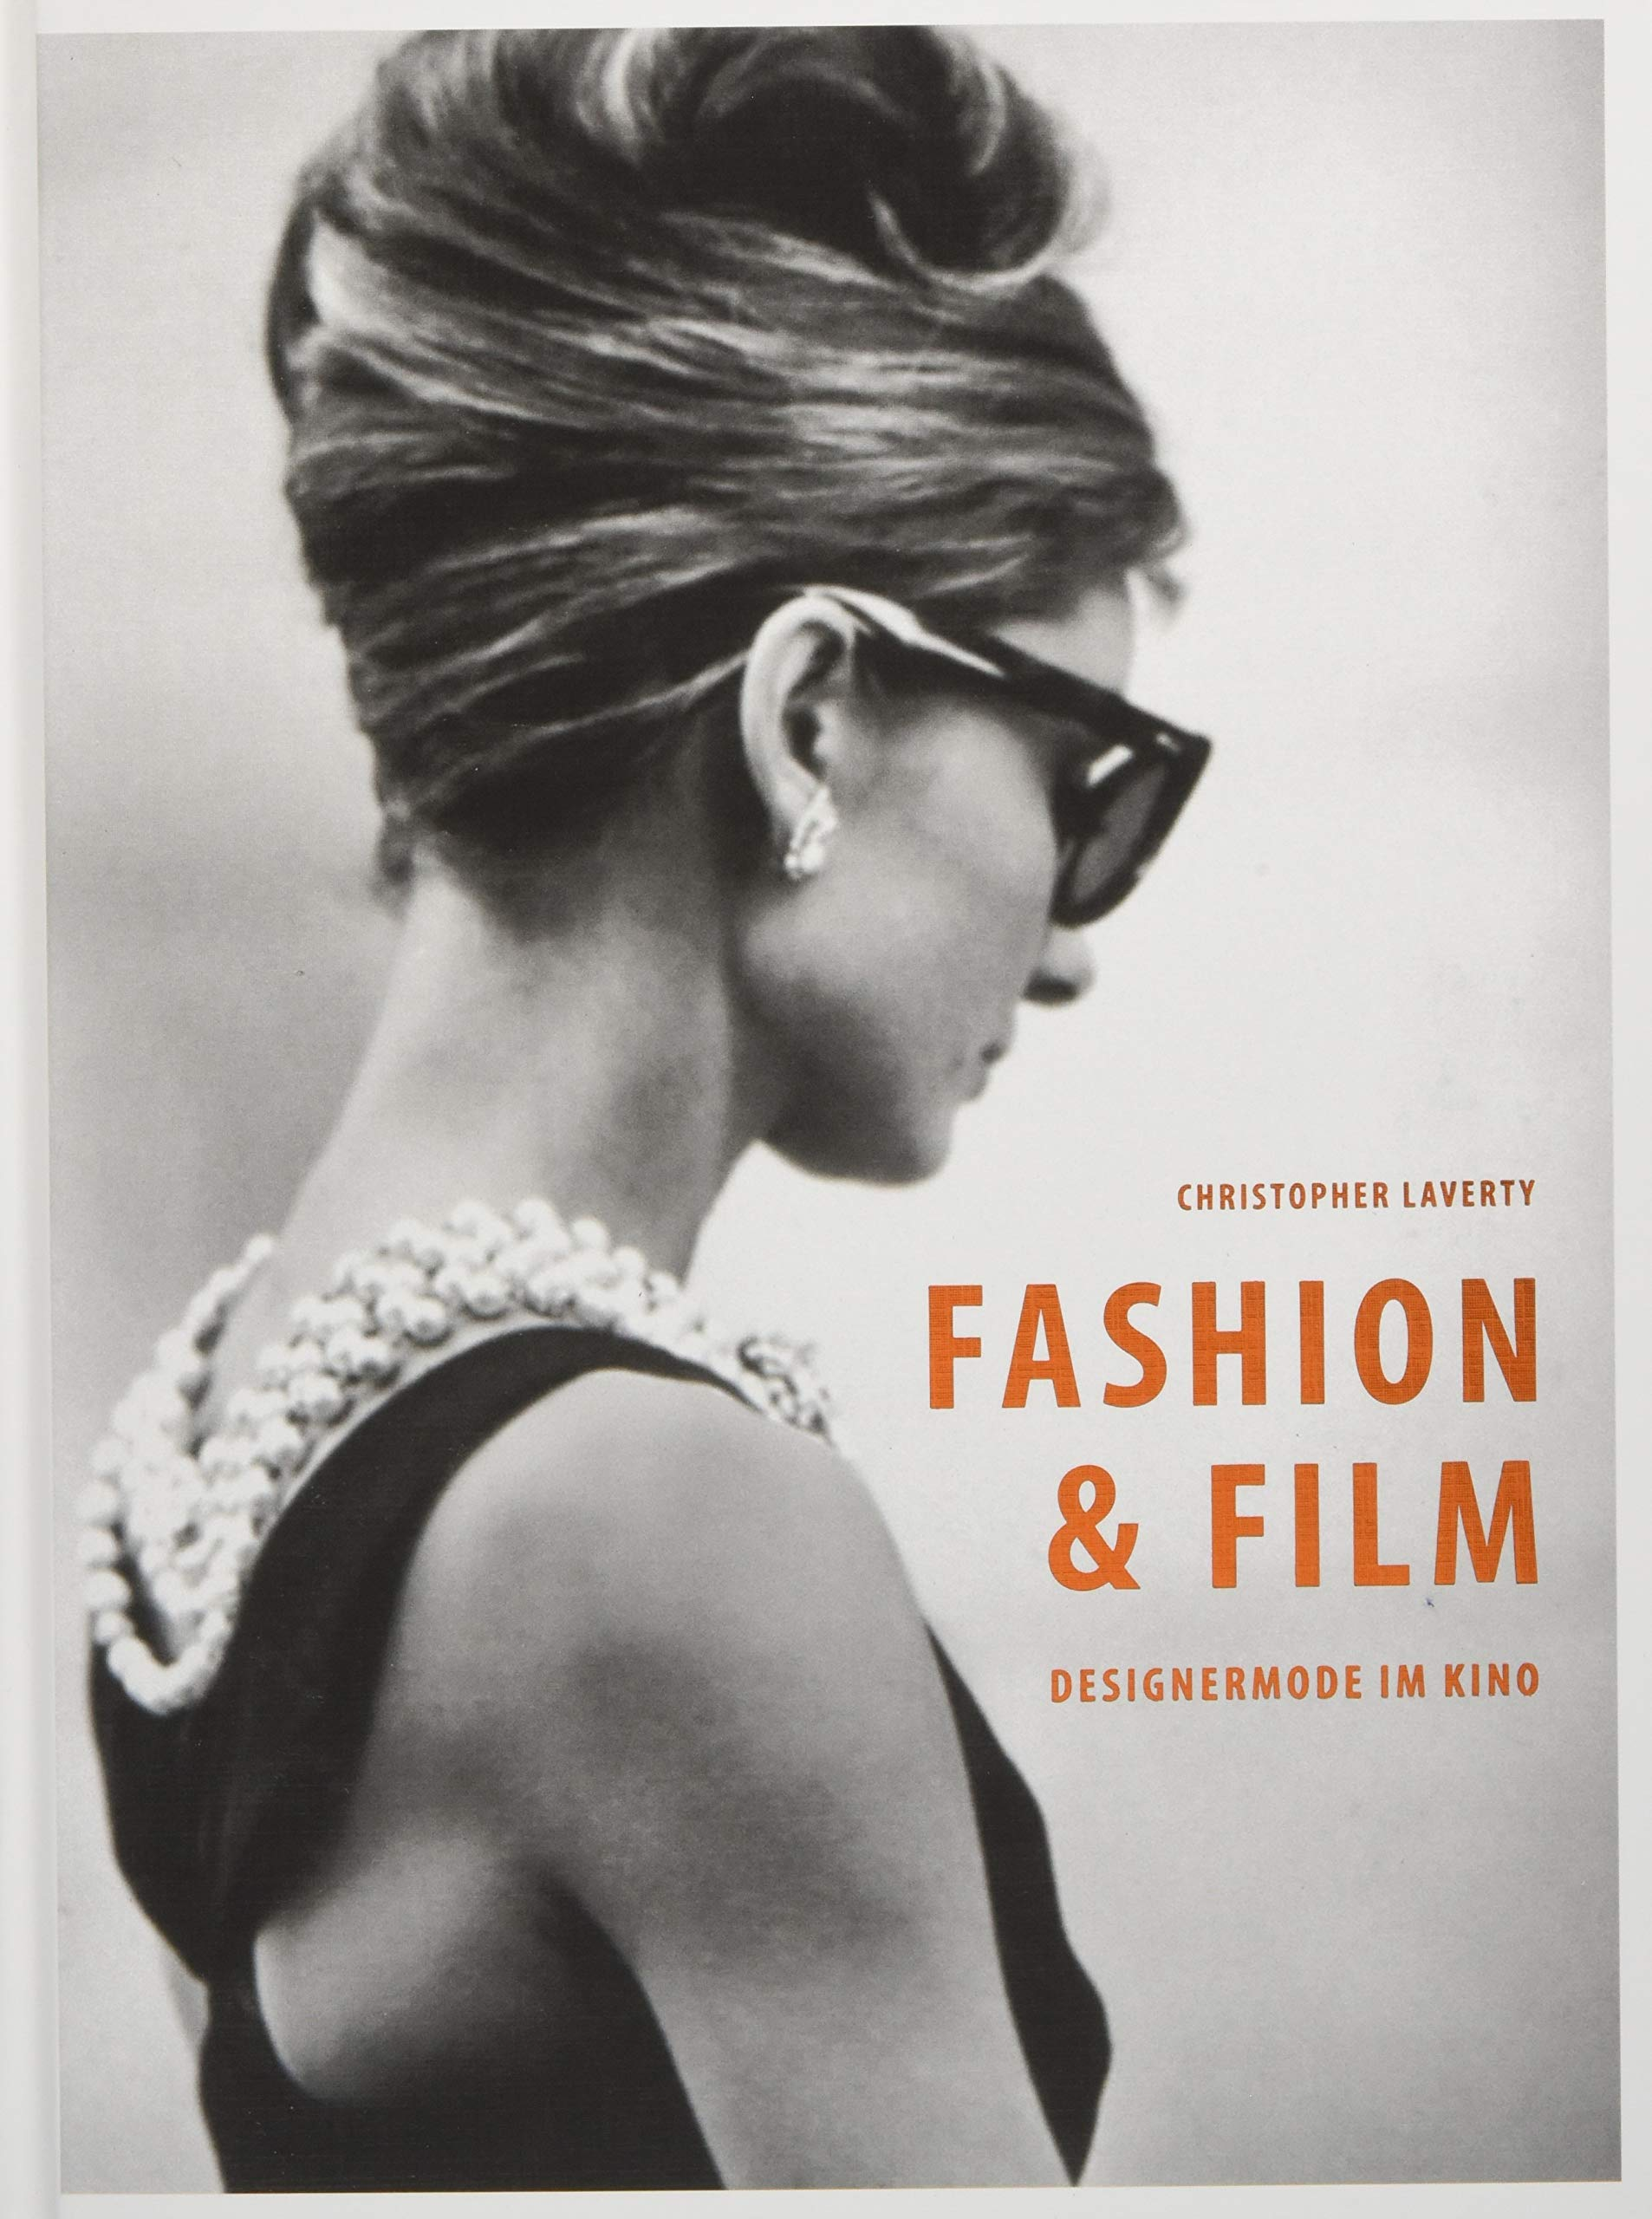 ea7d6451c437a1 Fashion   Film  Designermode im Kino  Amazon.de  Christopher Laverty   Bücher